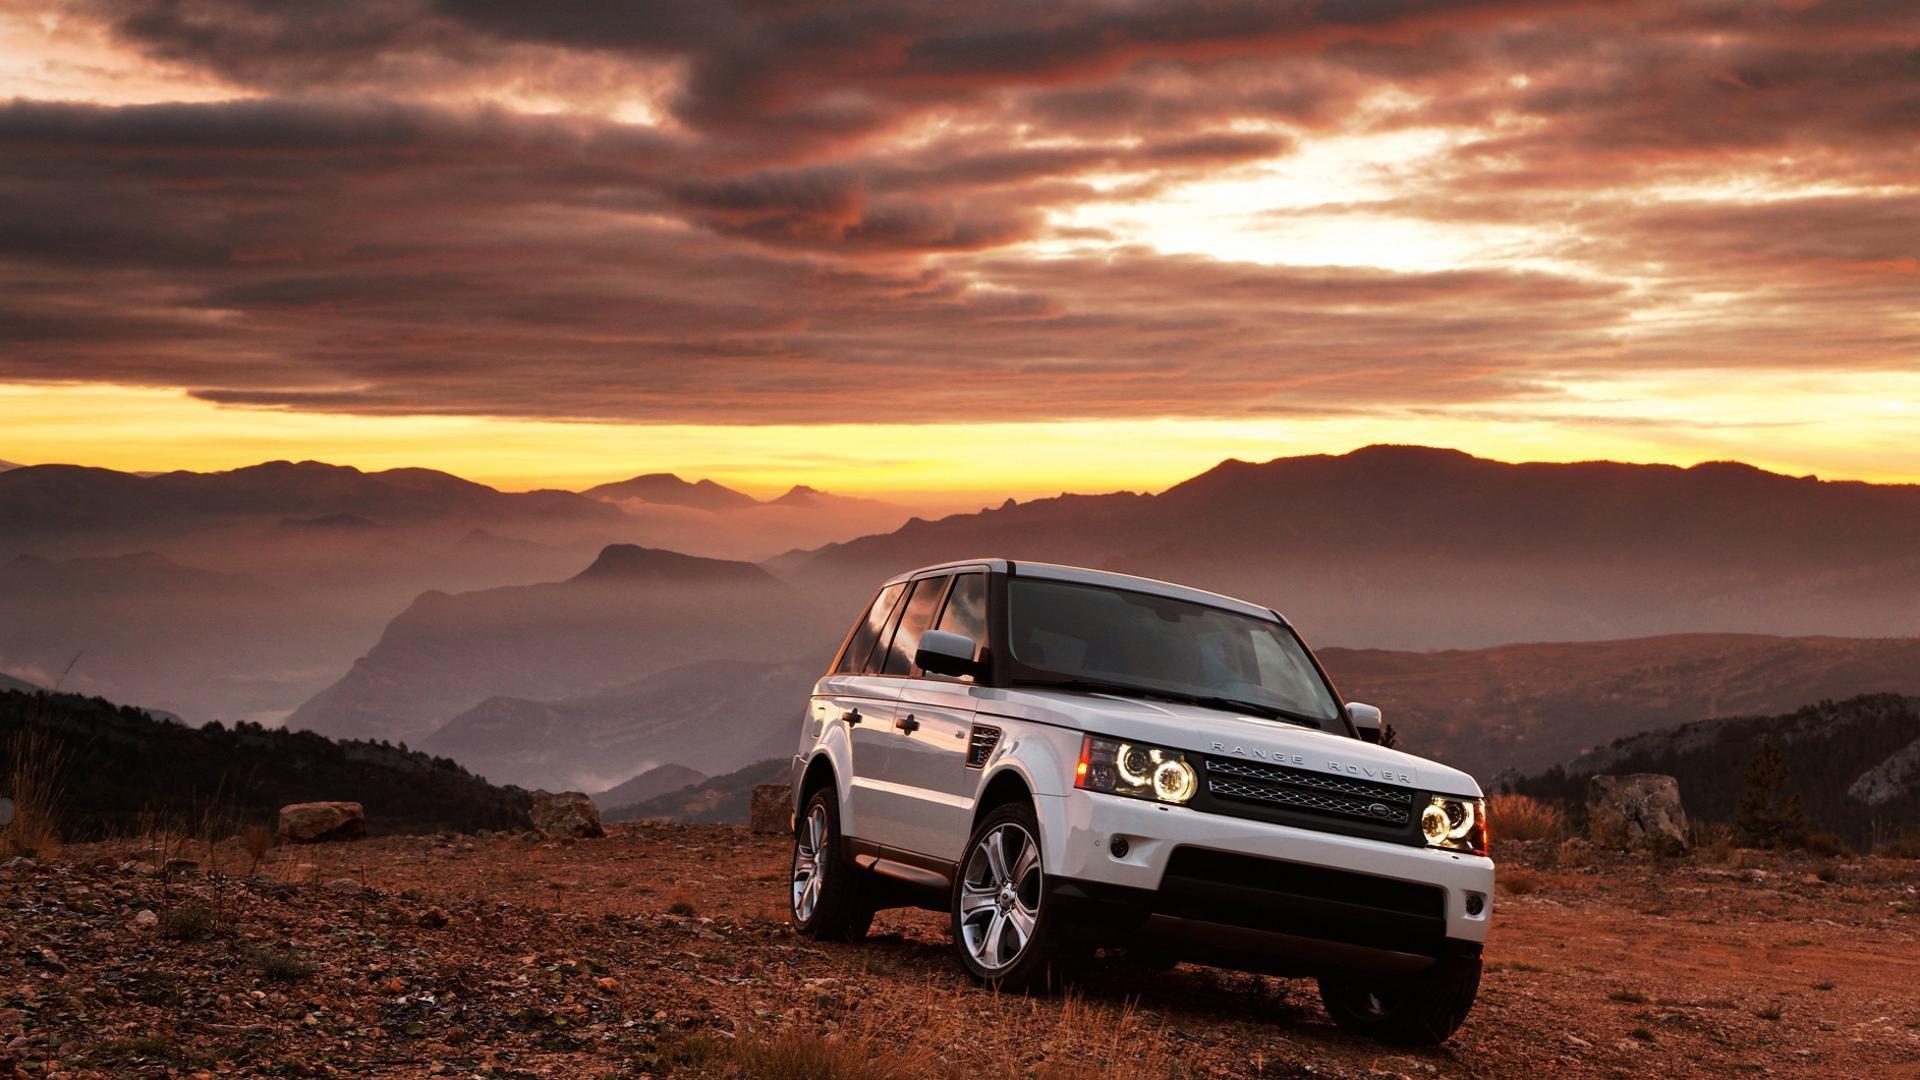 Range Rover Wallpapers 1920x1080 Full Hd 1080p Desktop Backgrounds